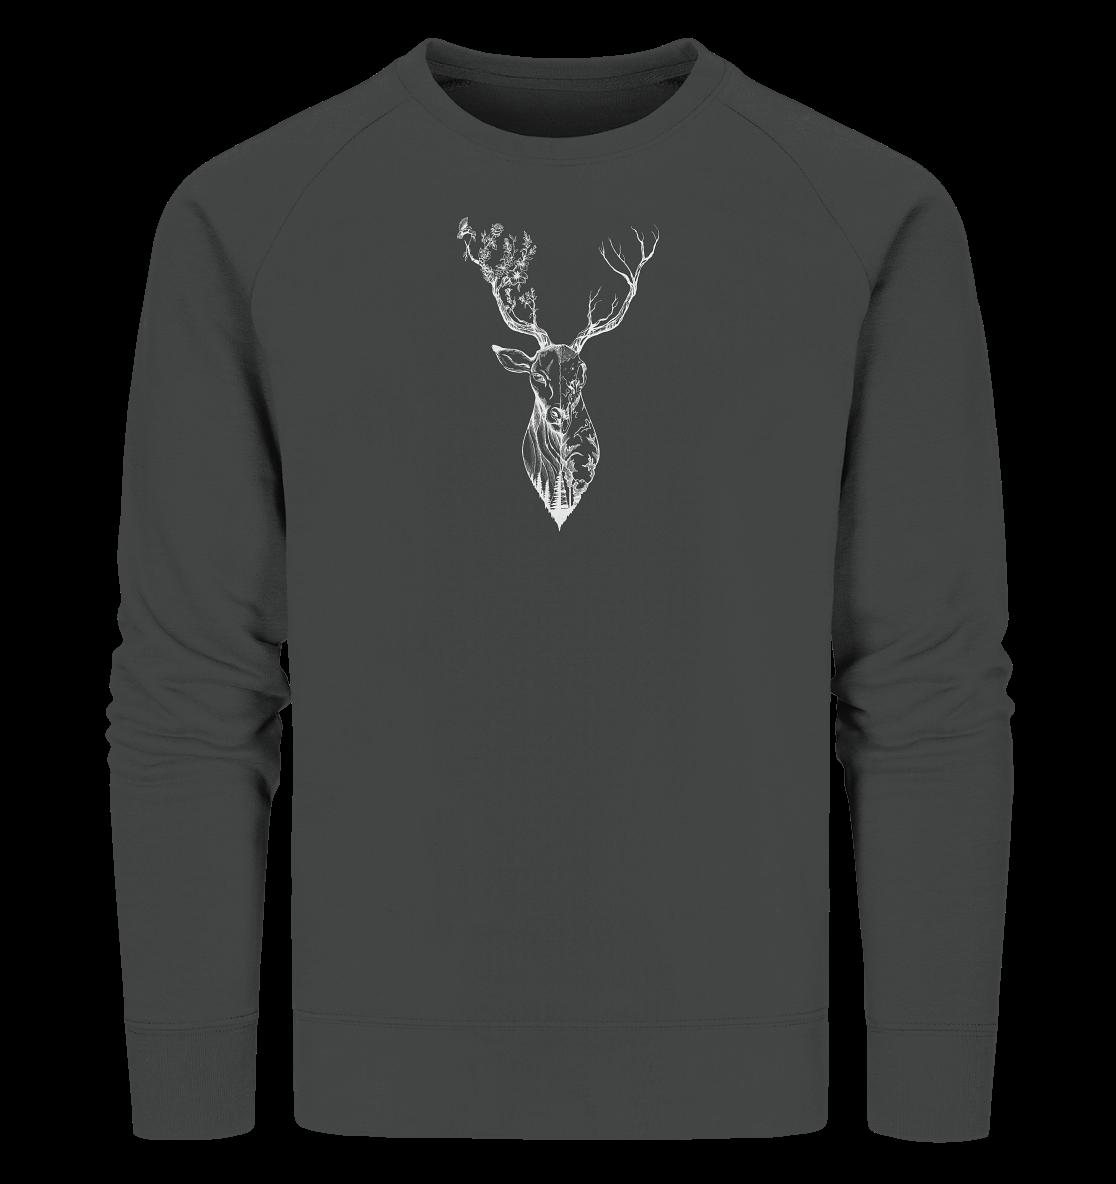 front-organic-sweatshirt-444545-1116x-5.png